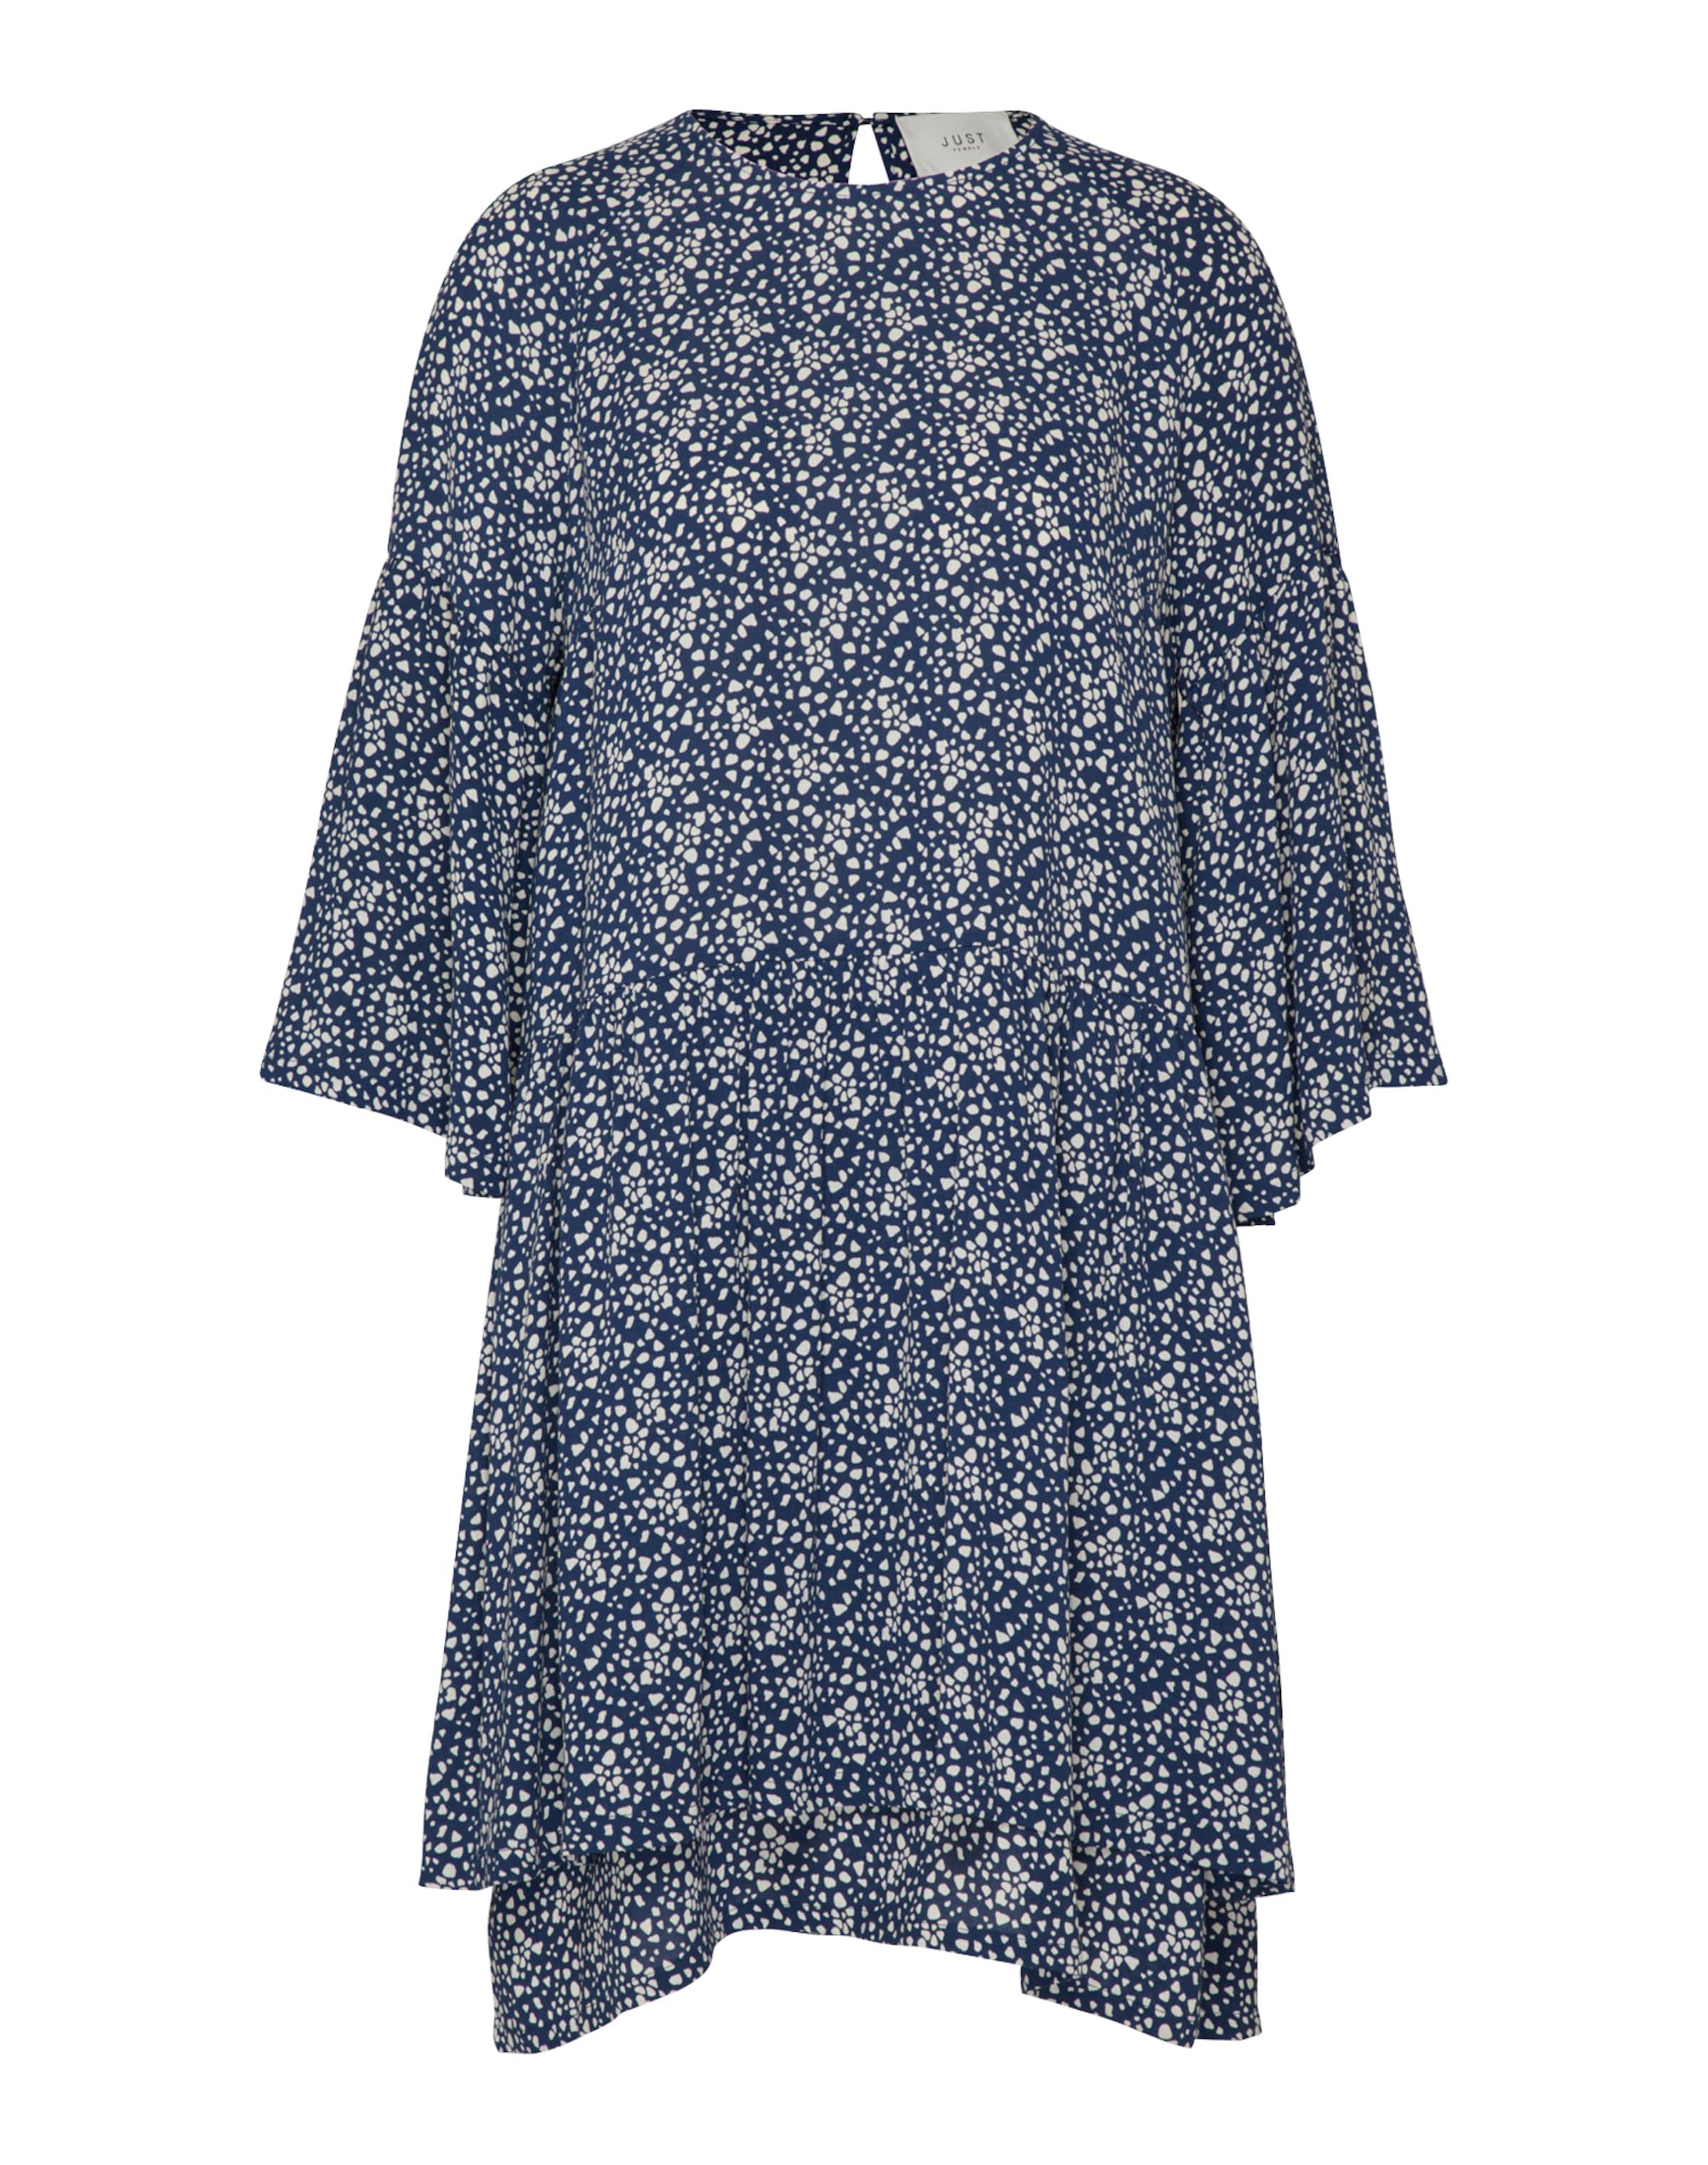 JUST FEMALE Kleid 'Garner' Original Günstiger Preis D8cKnpl6DF